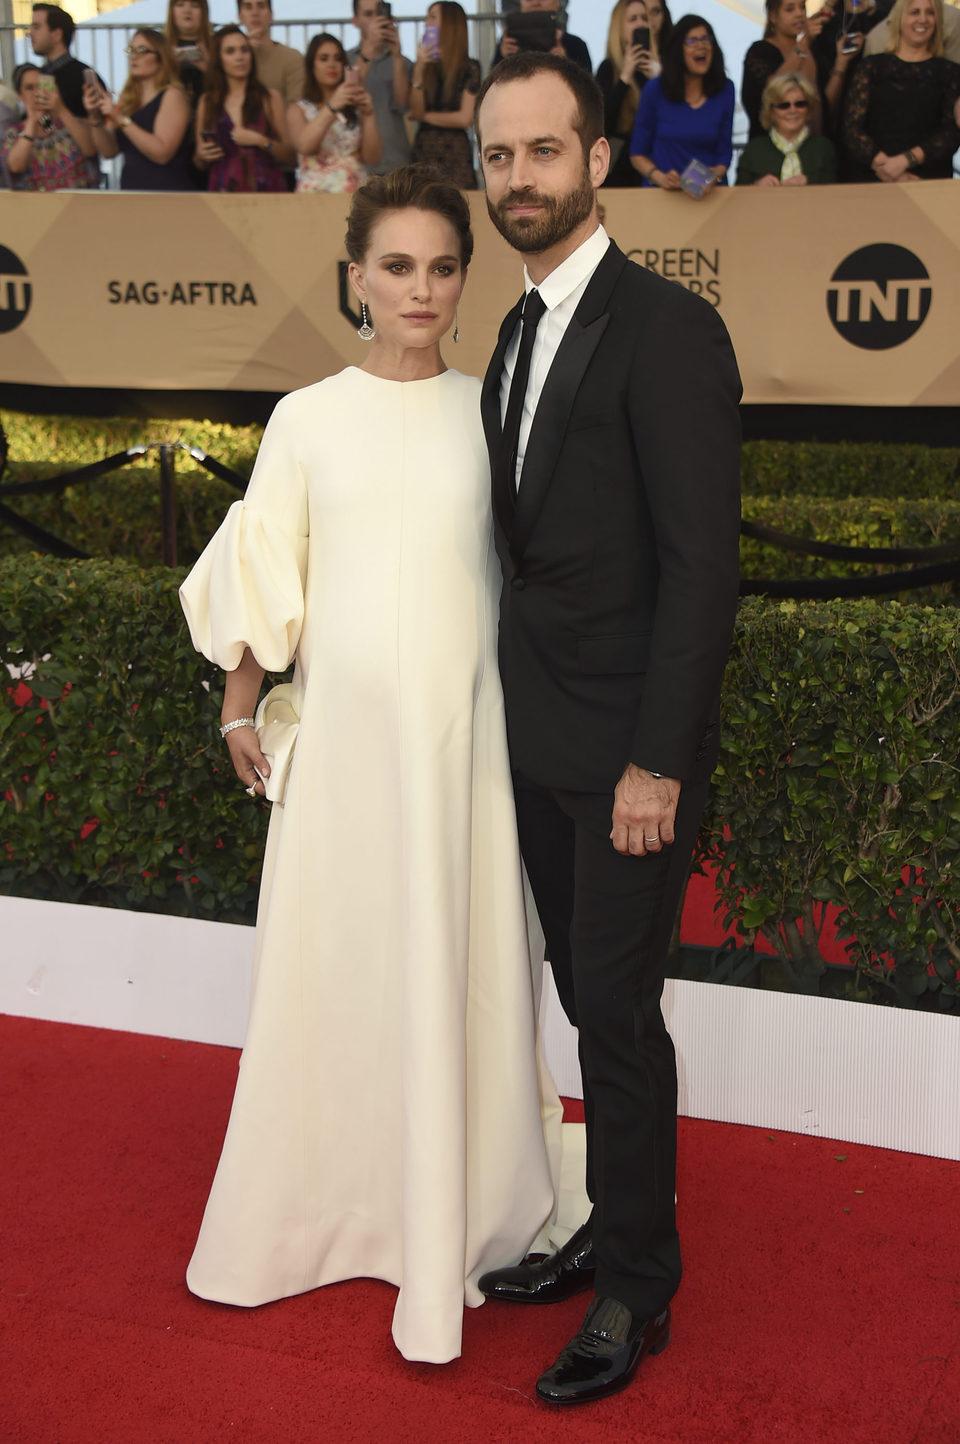 Natalie Portman and Benjamin Millepied on the red carpet of SAG Awards 2017